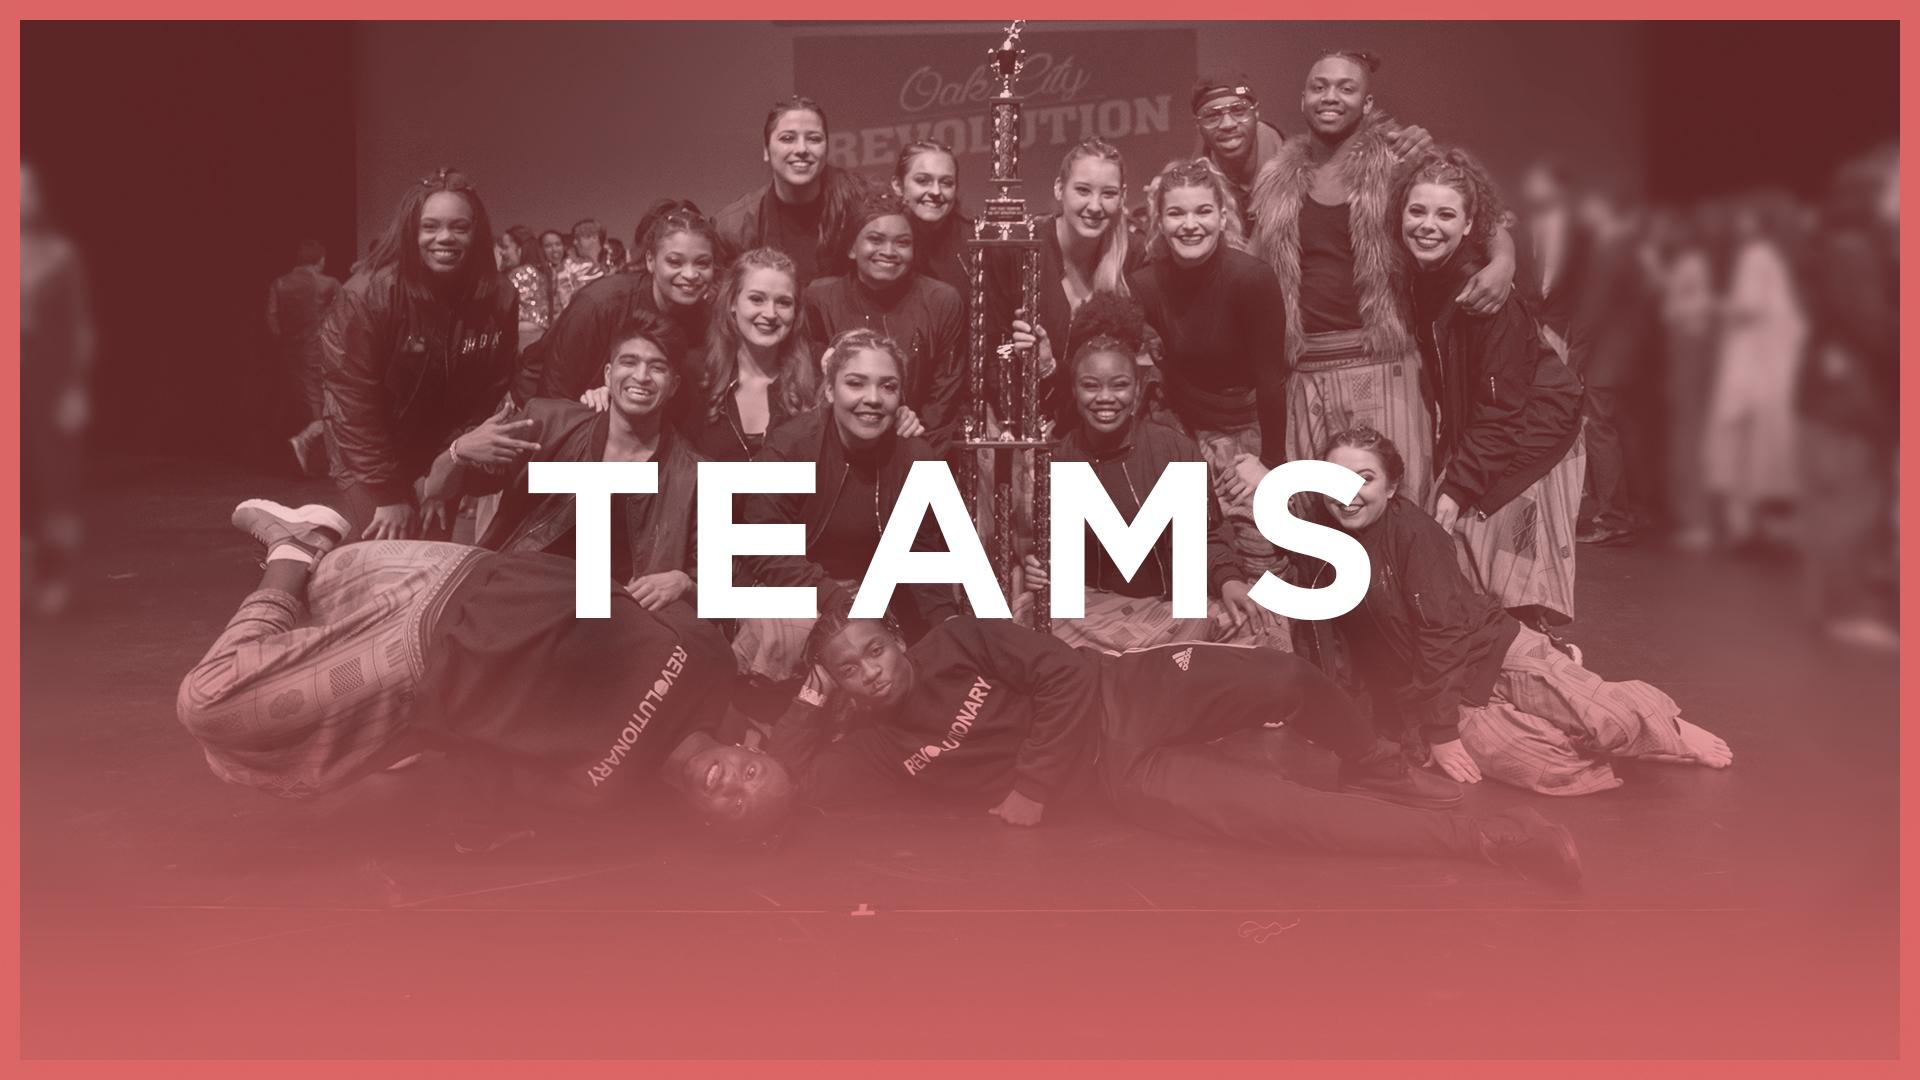 Teams WebThumbnail.jpg